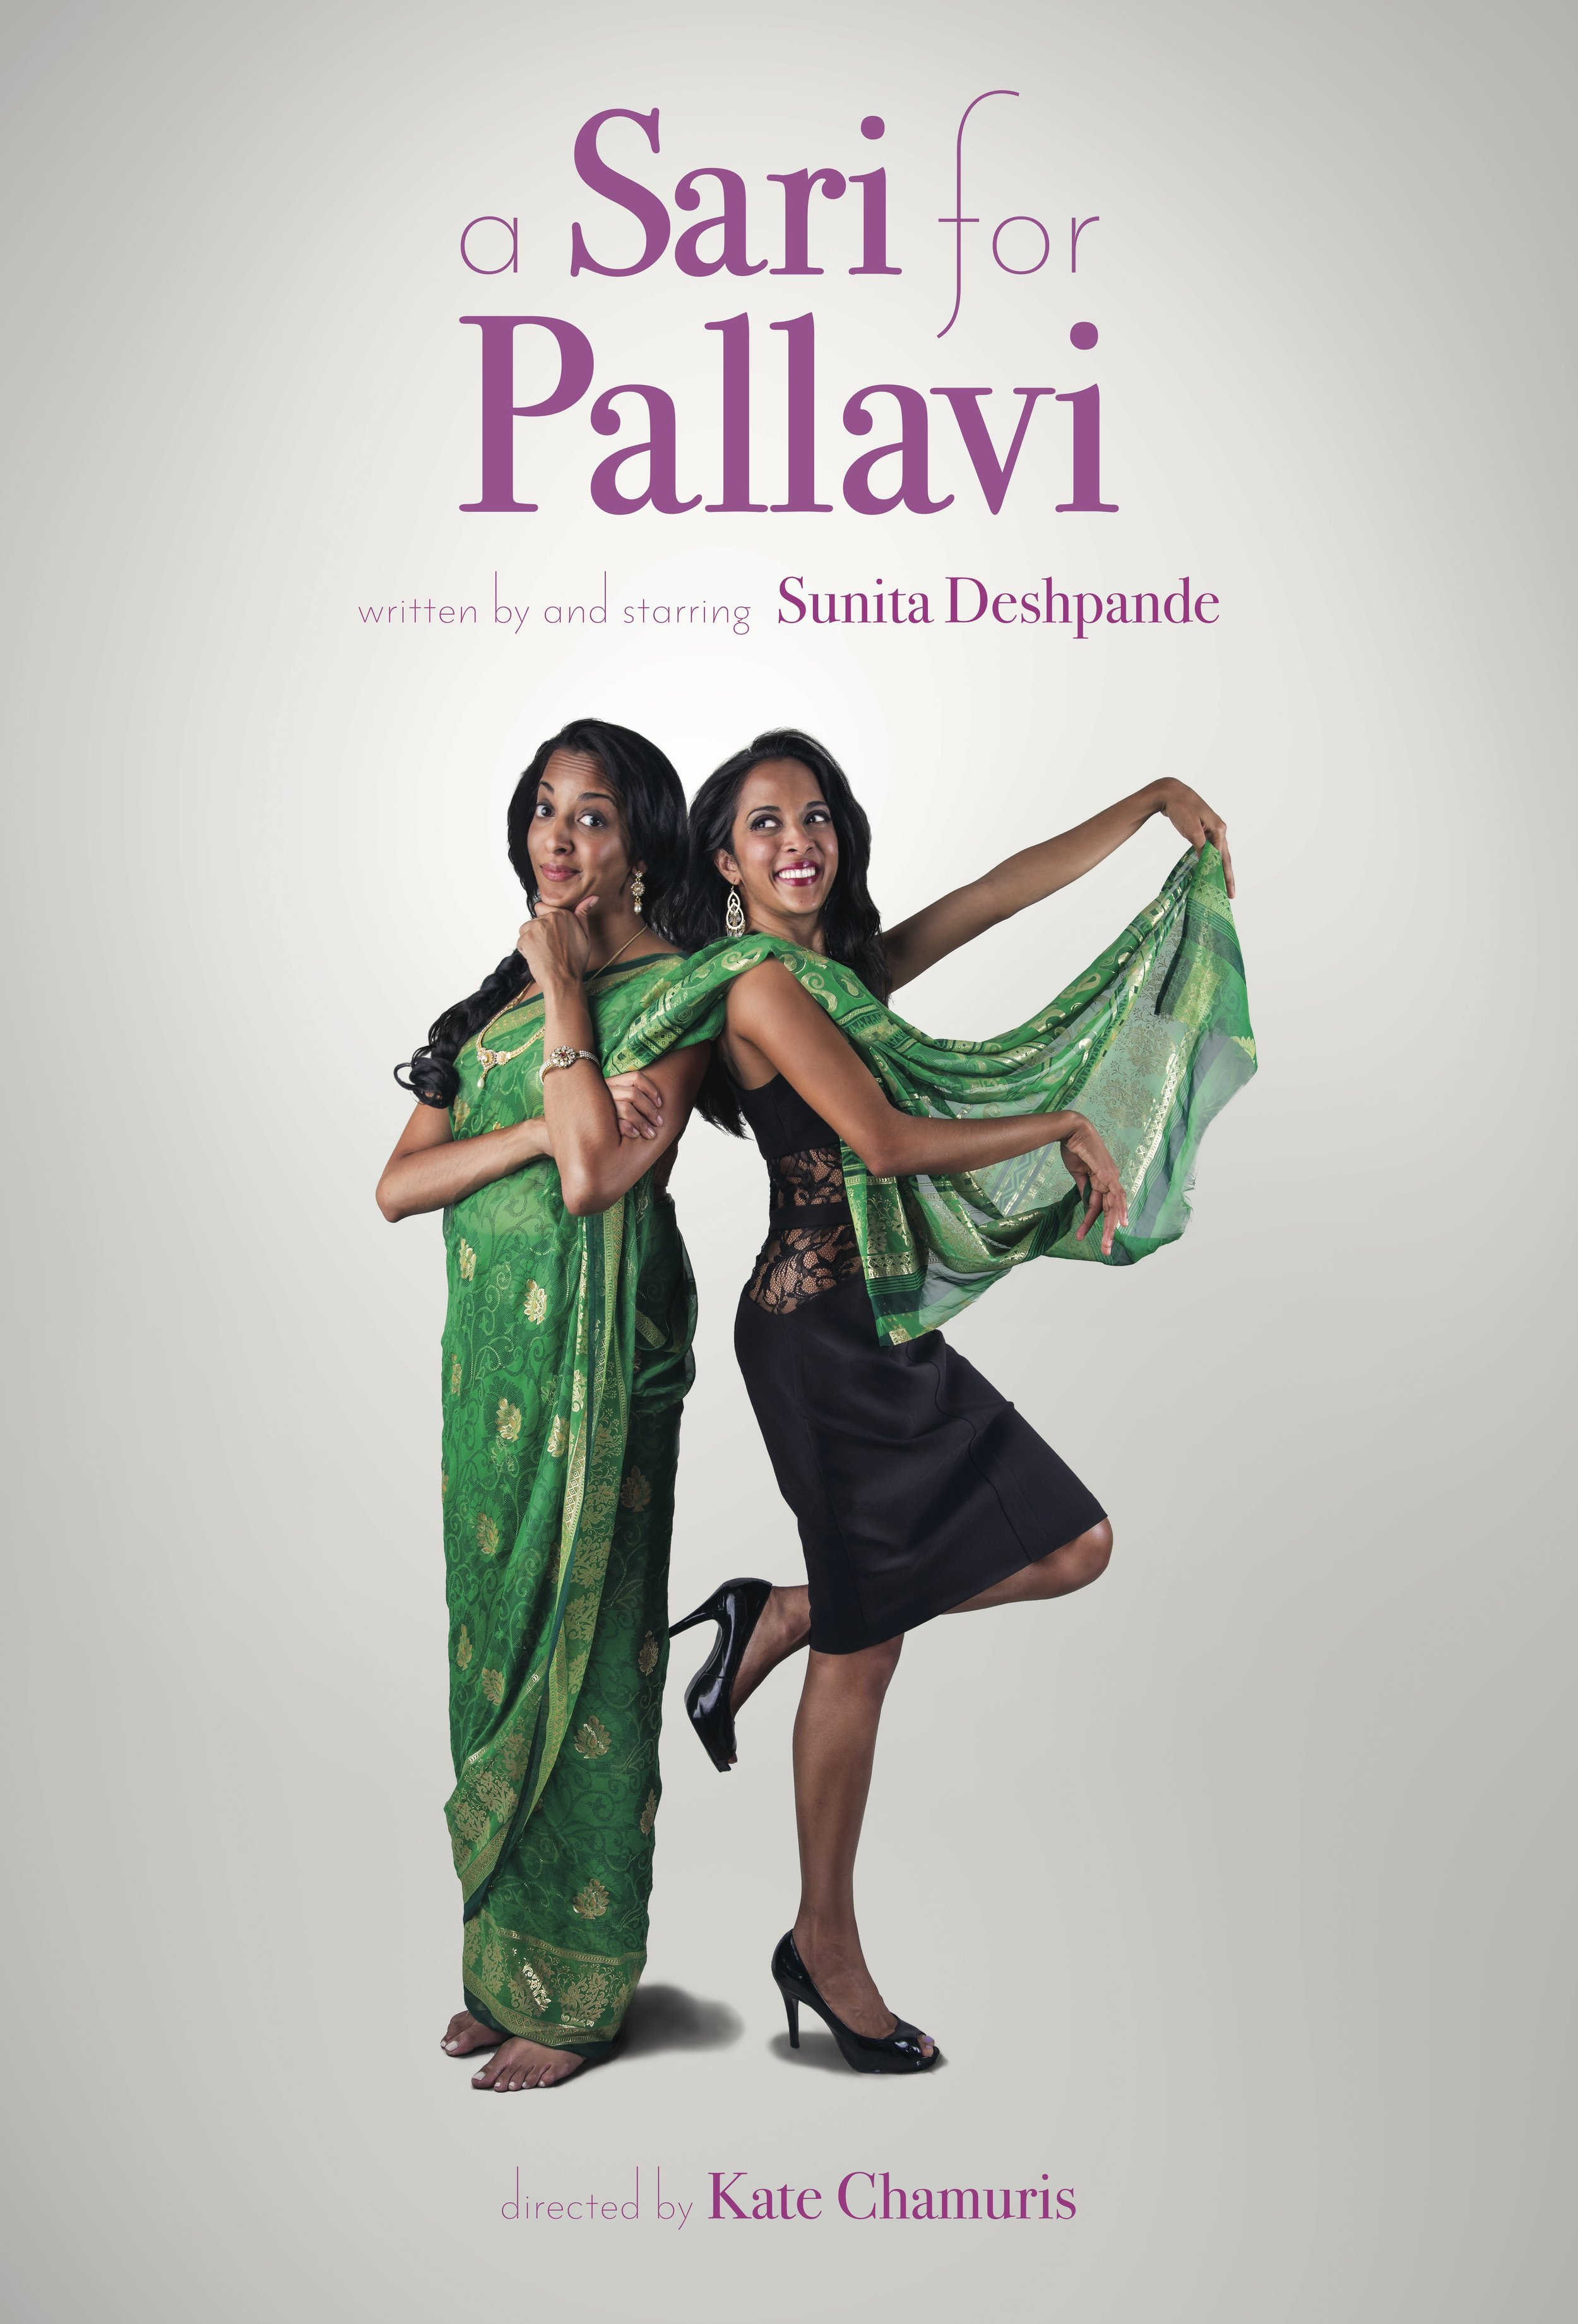 A Sari for Pallavi poster